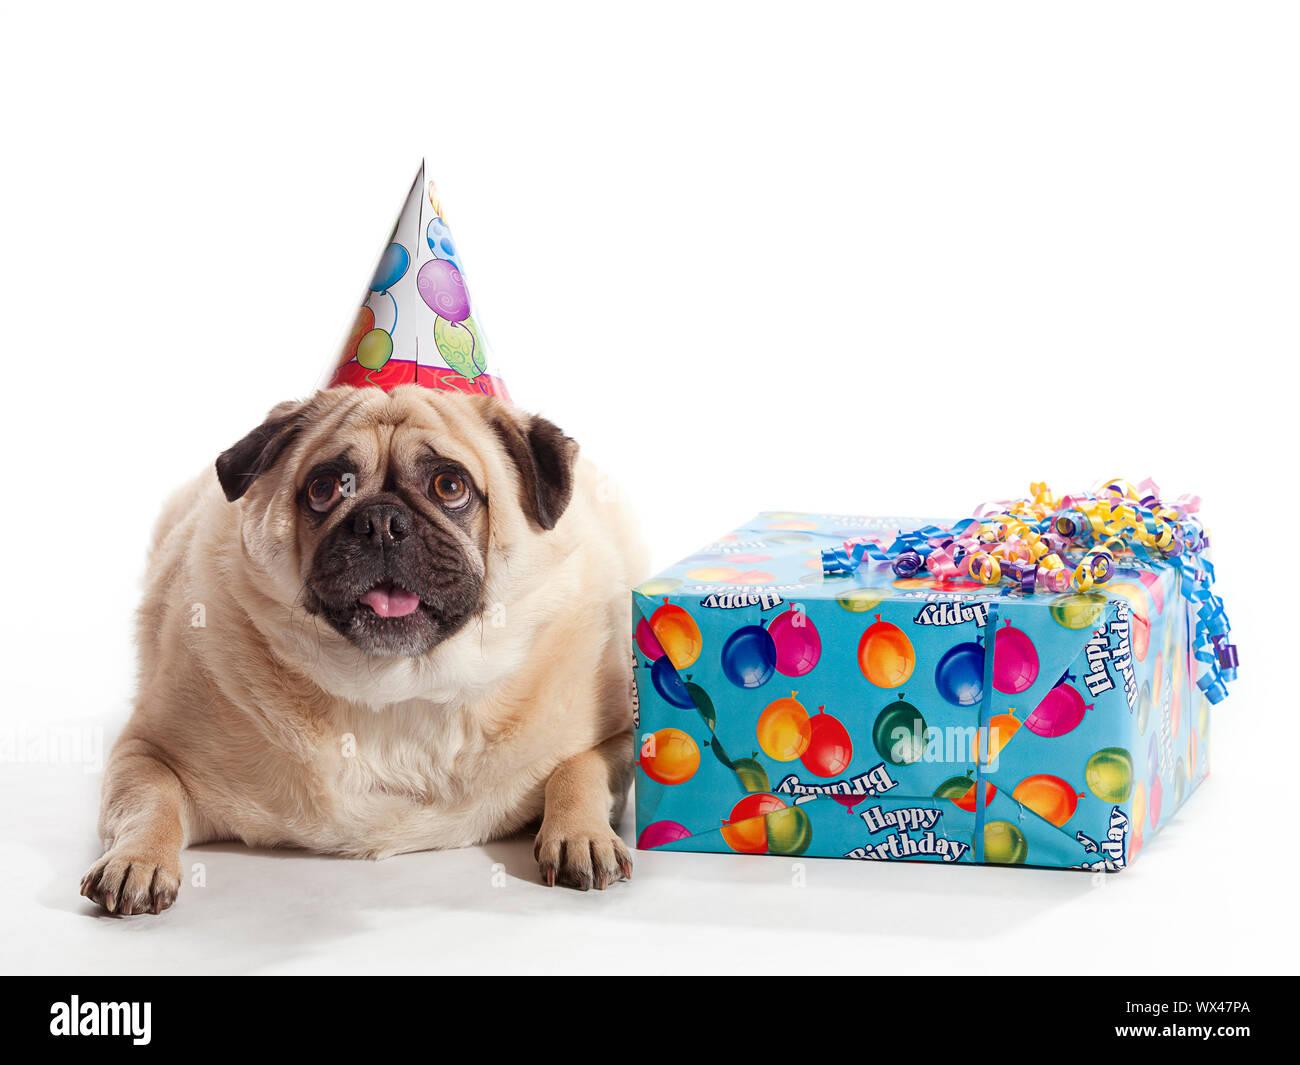 Birthday Pug High Resolution Stock Photography And Images Alamy